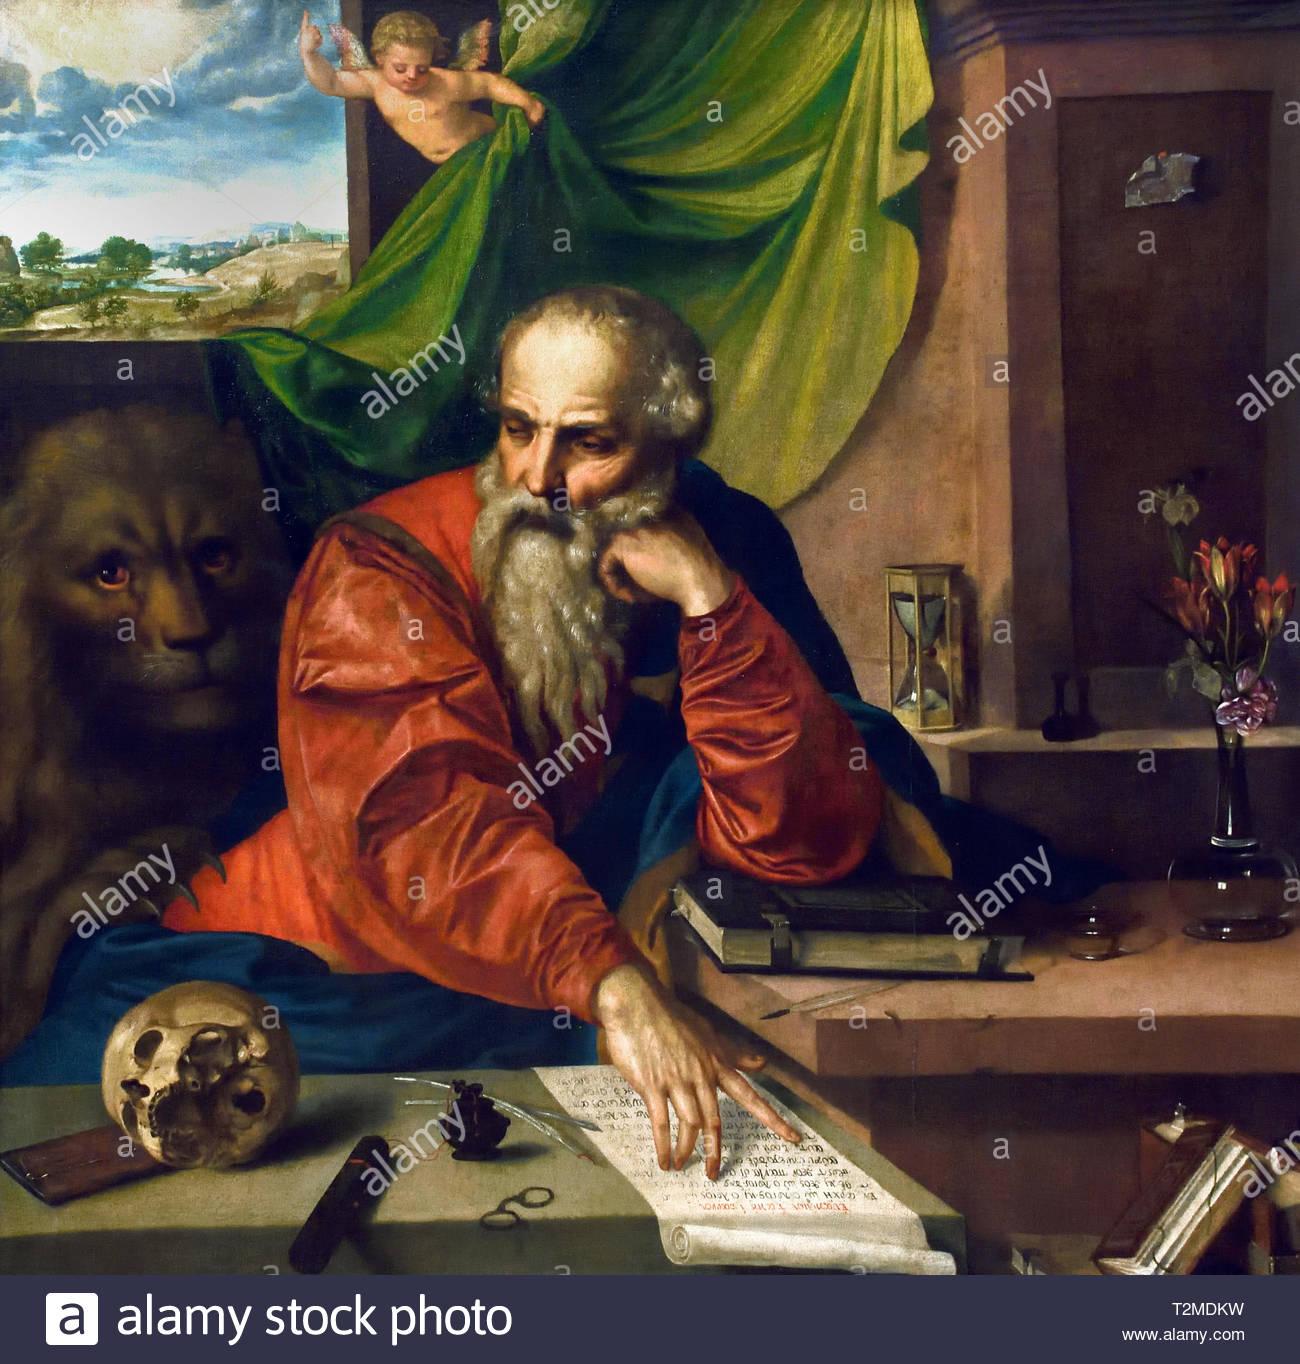 saint jerome meditating 1548 georg pencz 1500 1550 german germany T2MDKW